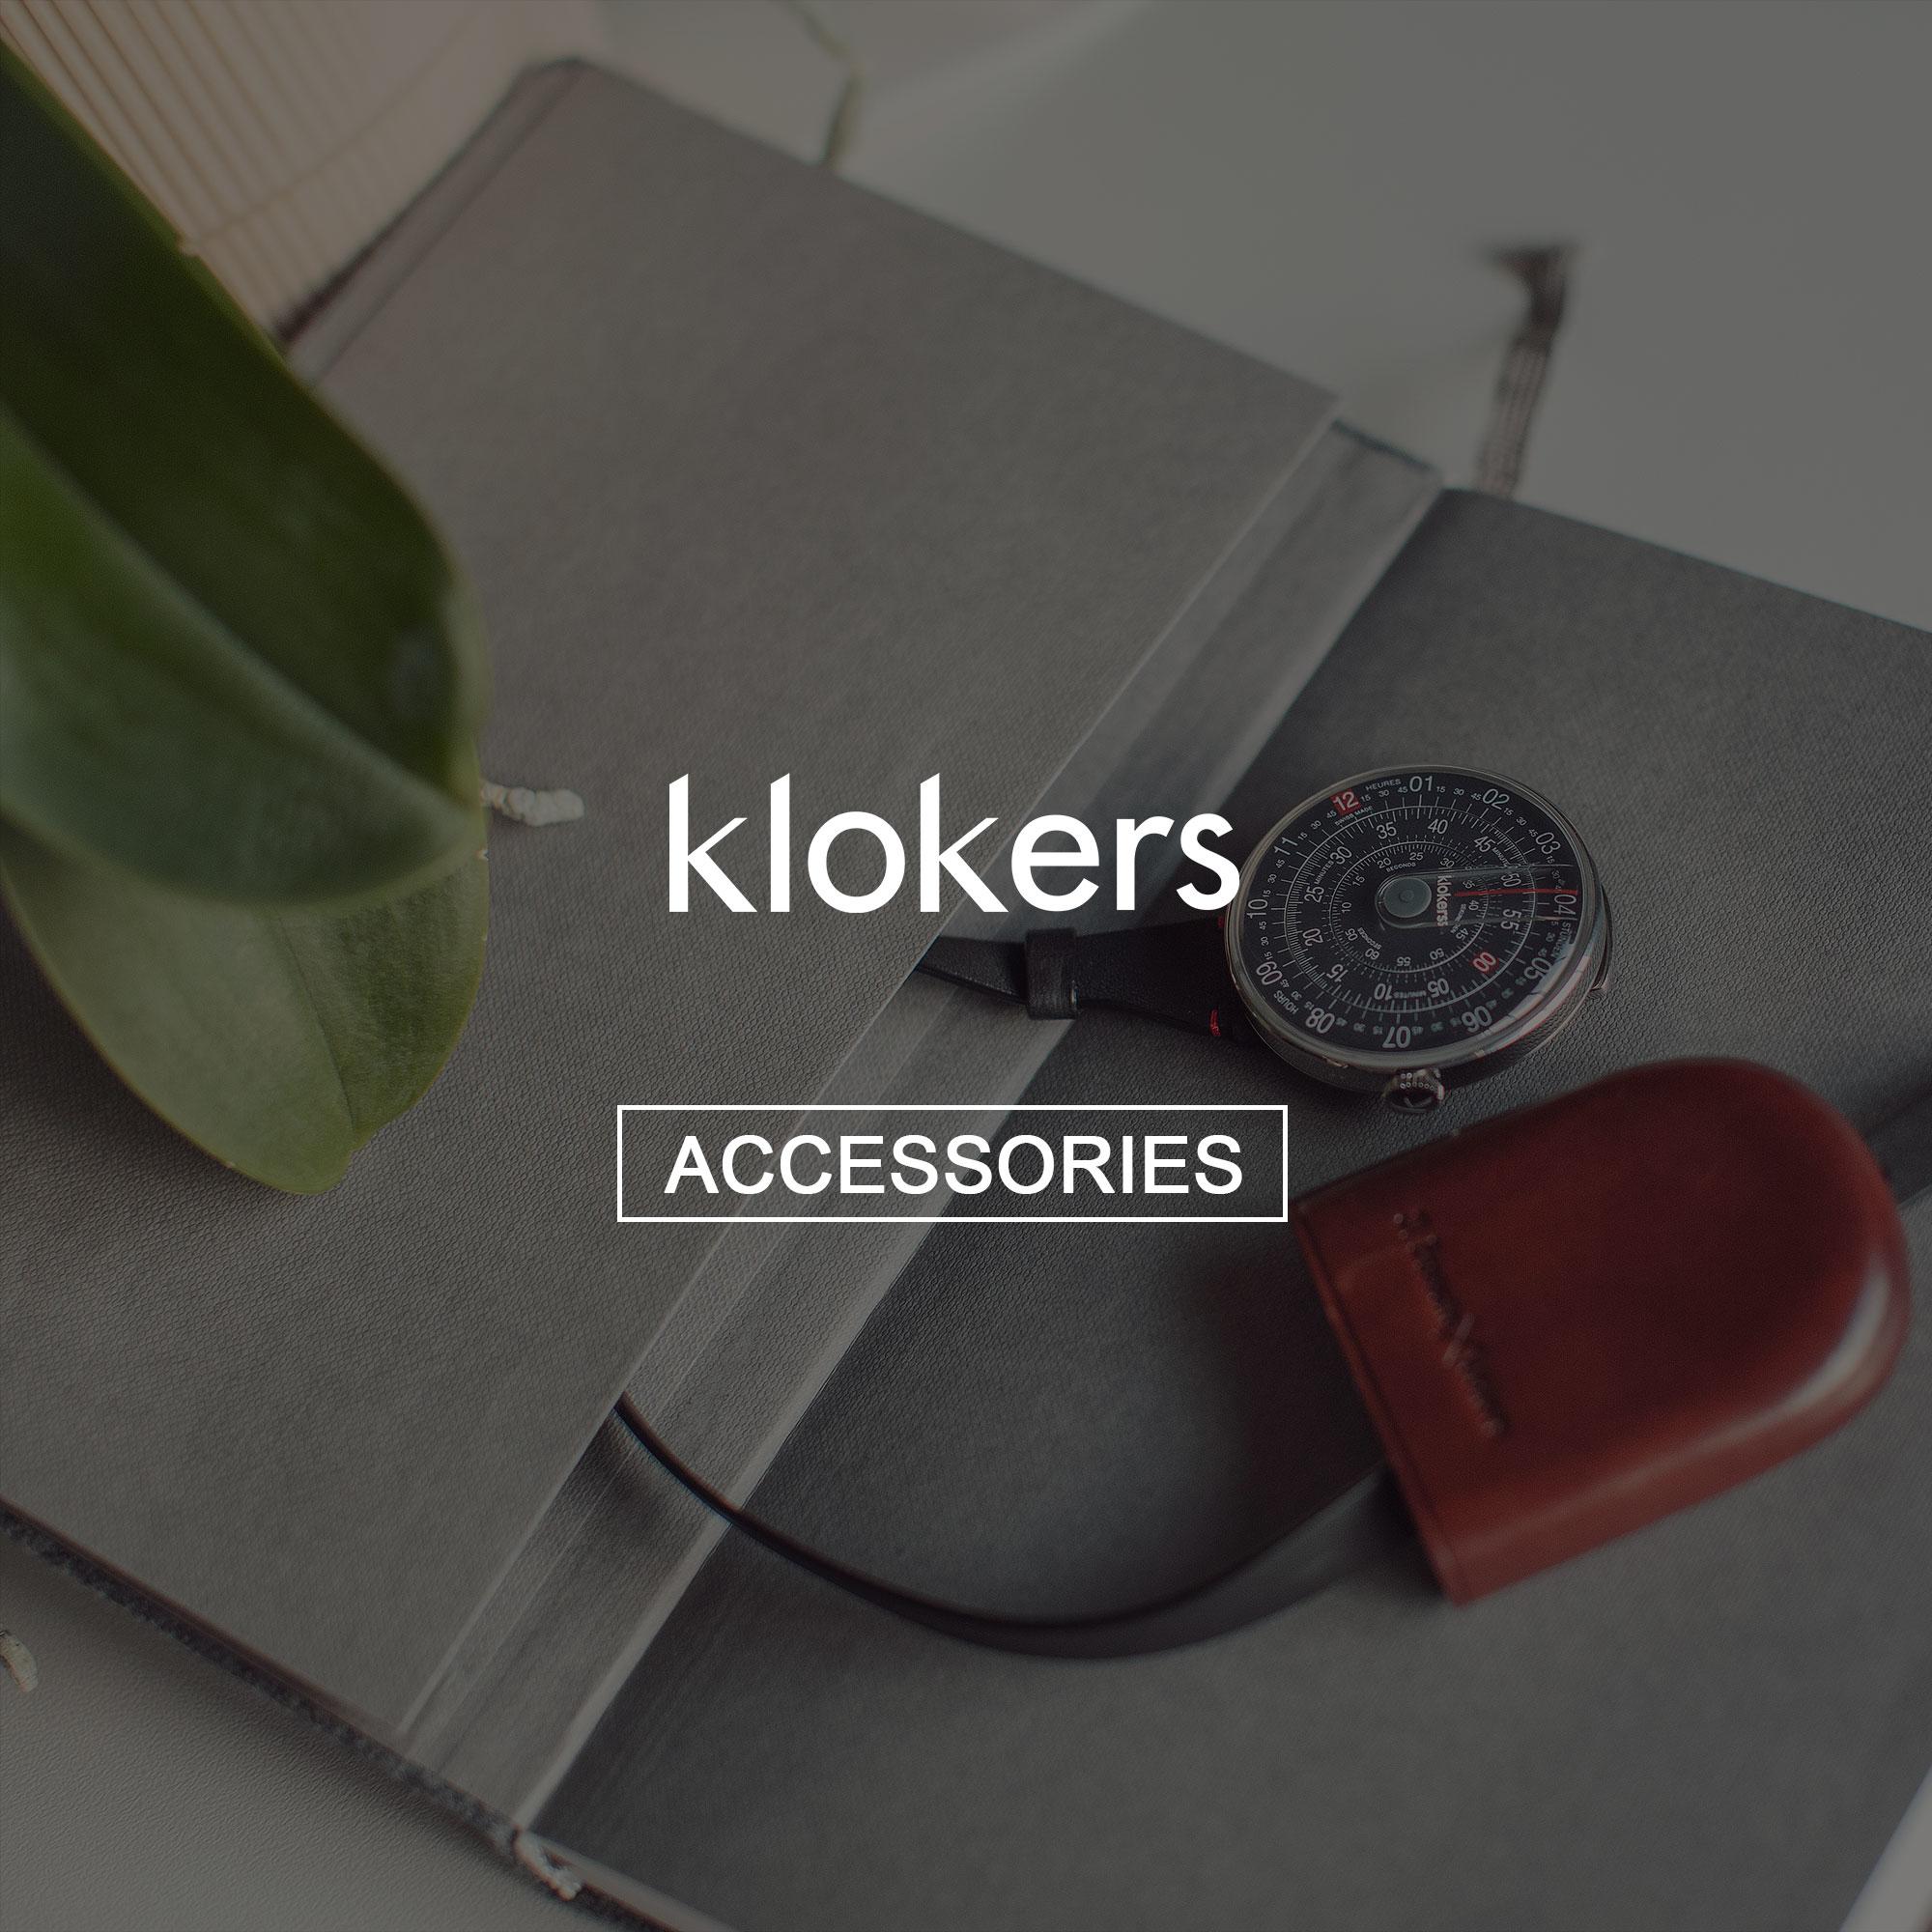 klokers ,庫克錶,奧創,Ultra Gears,